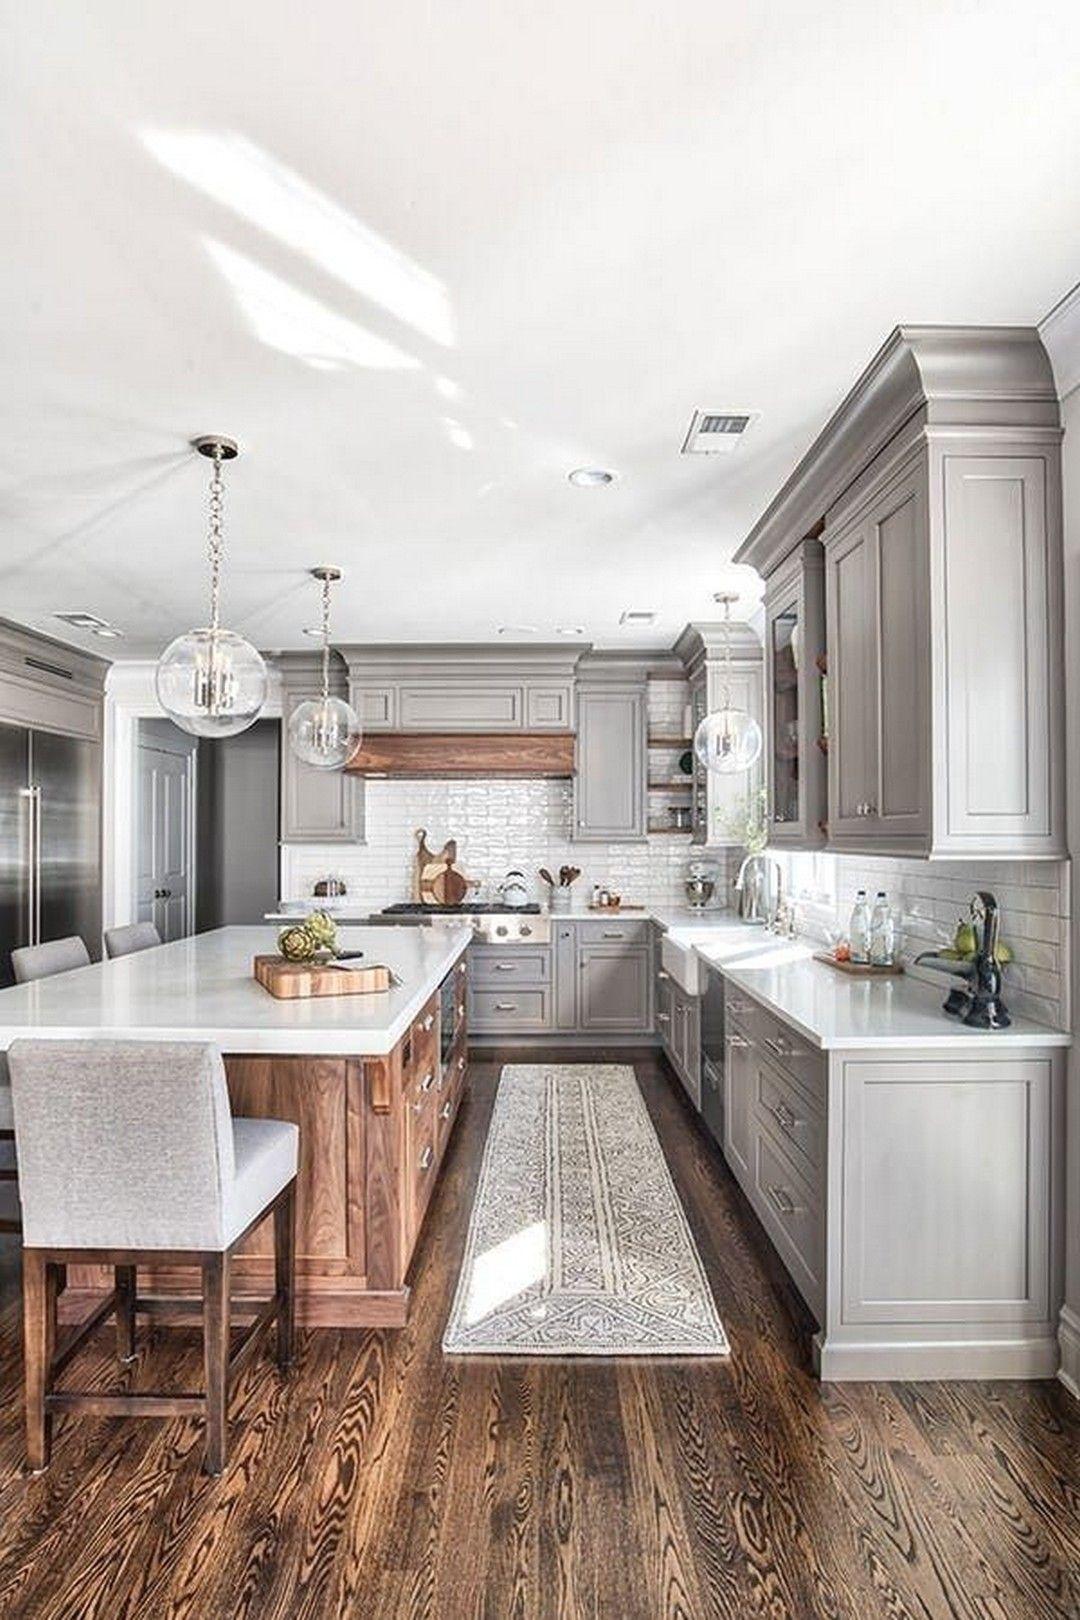 12 Charming View Of The Kitchen Decortheraphy Com Modern Farmhouse Kitchens Elegant Kitchens Kitchen Layout